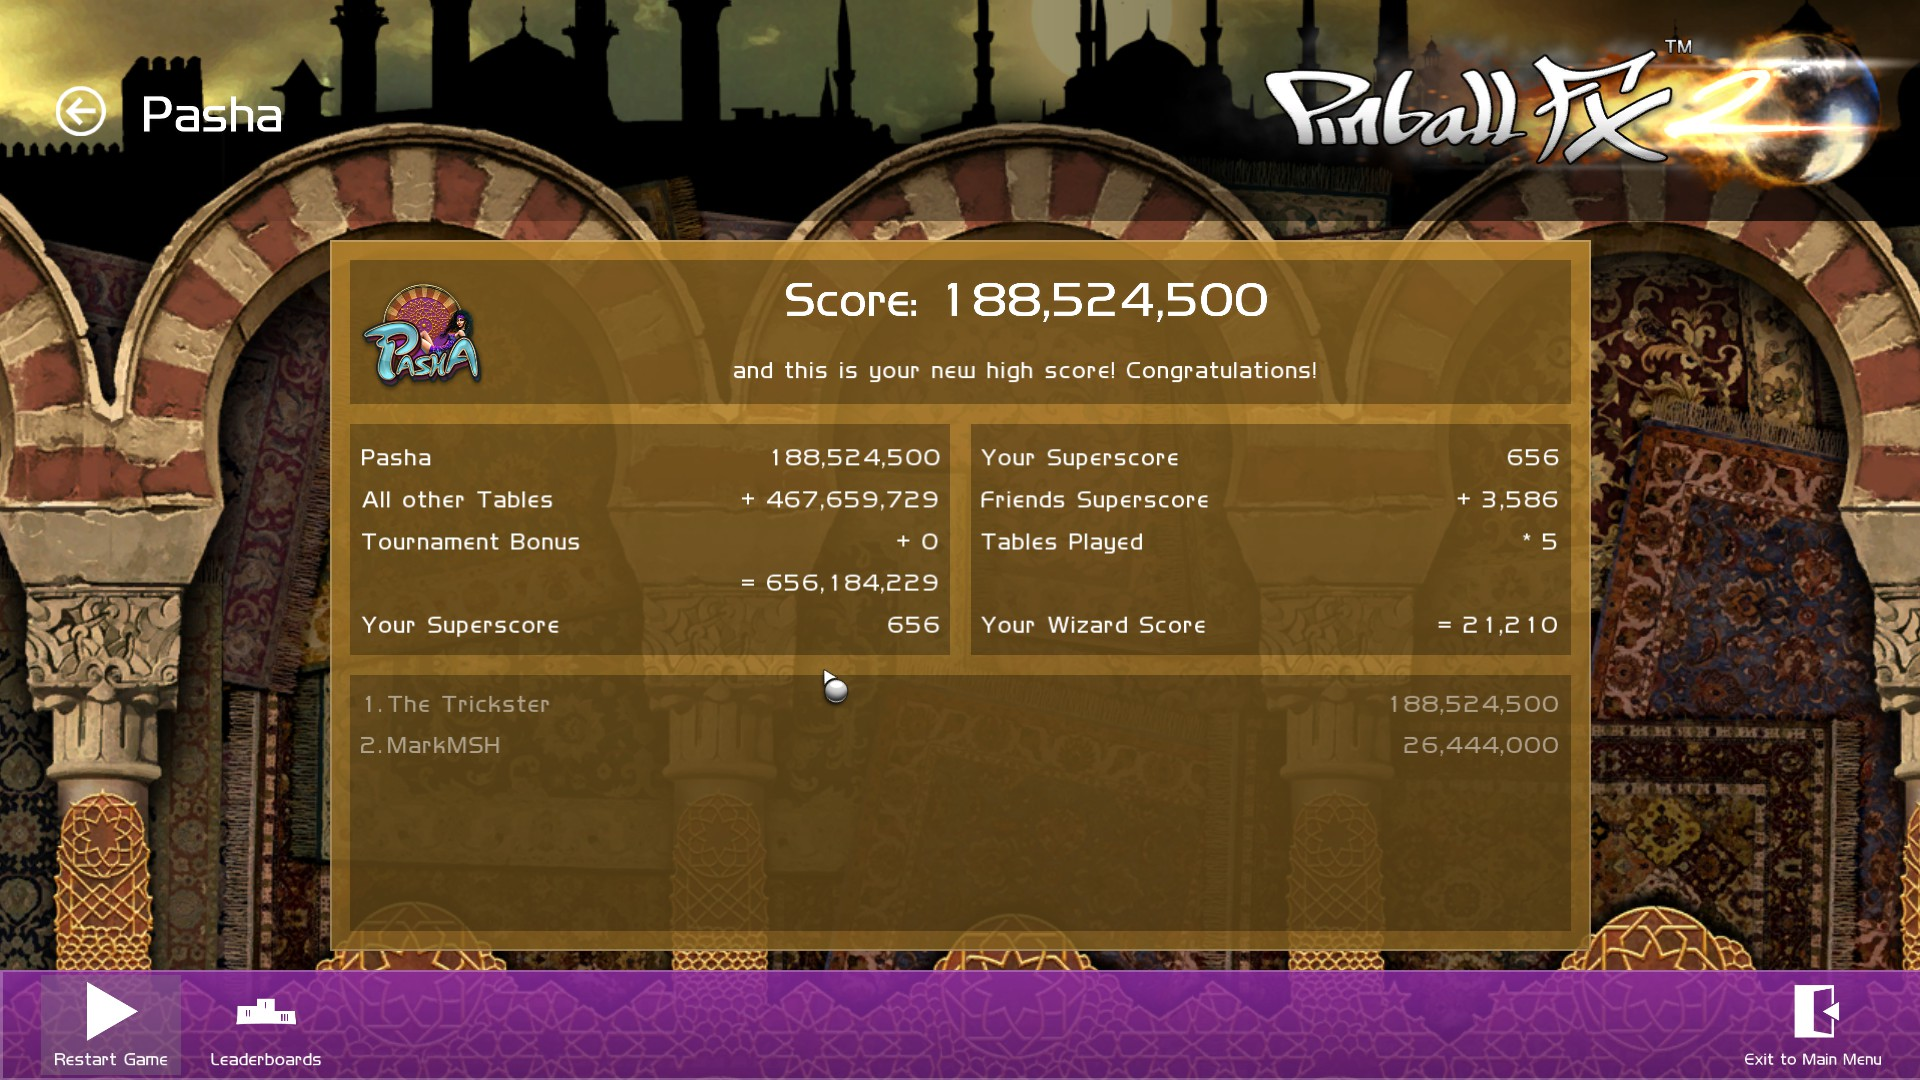 Pinball FX 2: Pasha 188,524,500 points